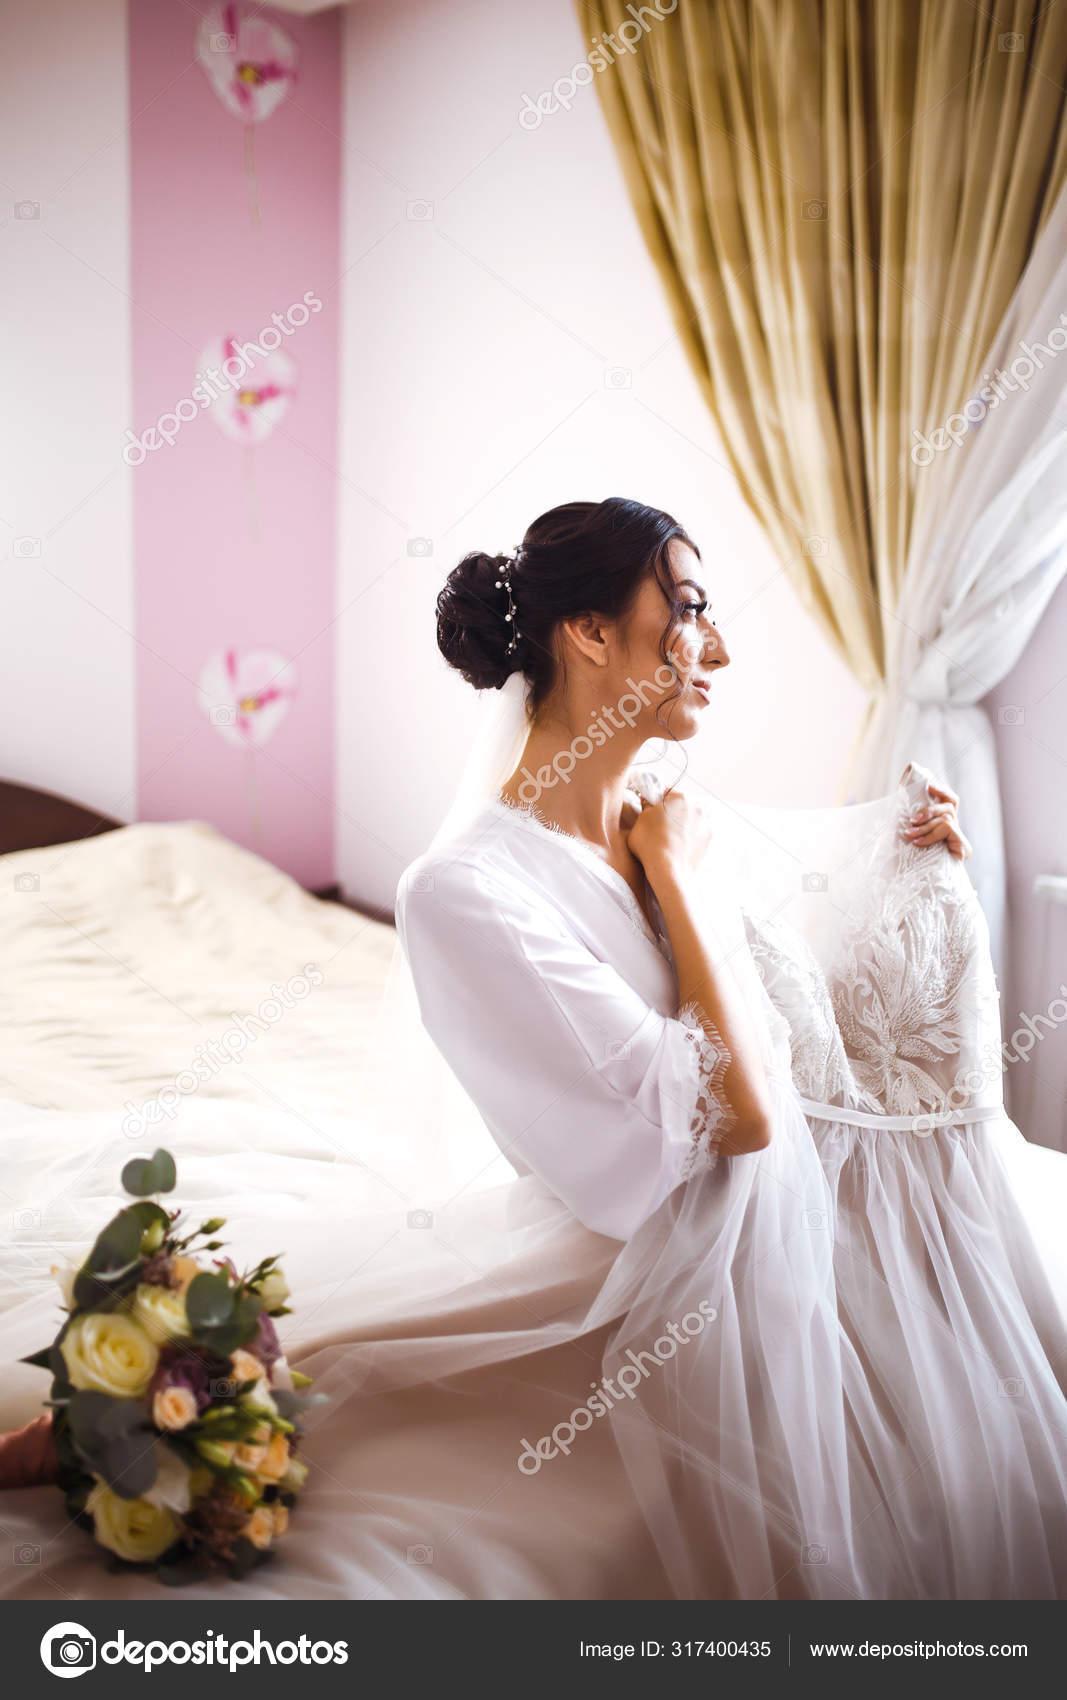 Morning Beautiful Bride Wedding Dress Bride White Robe Holds